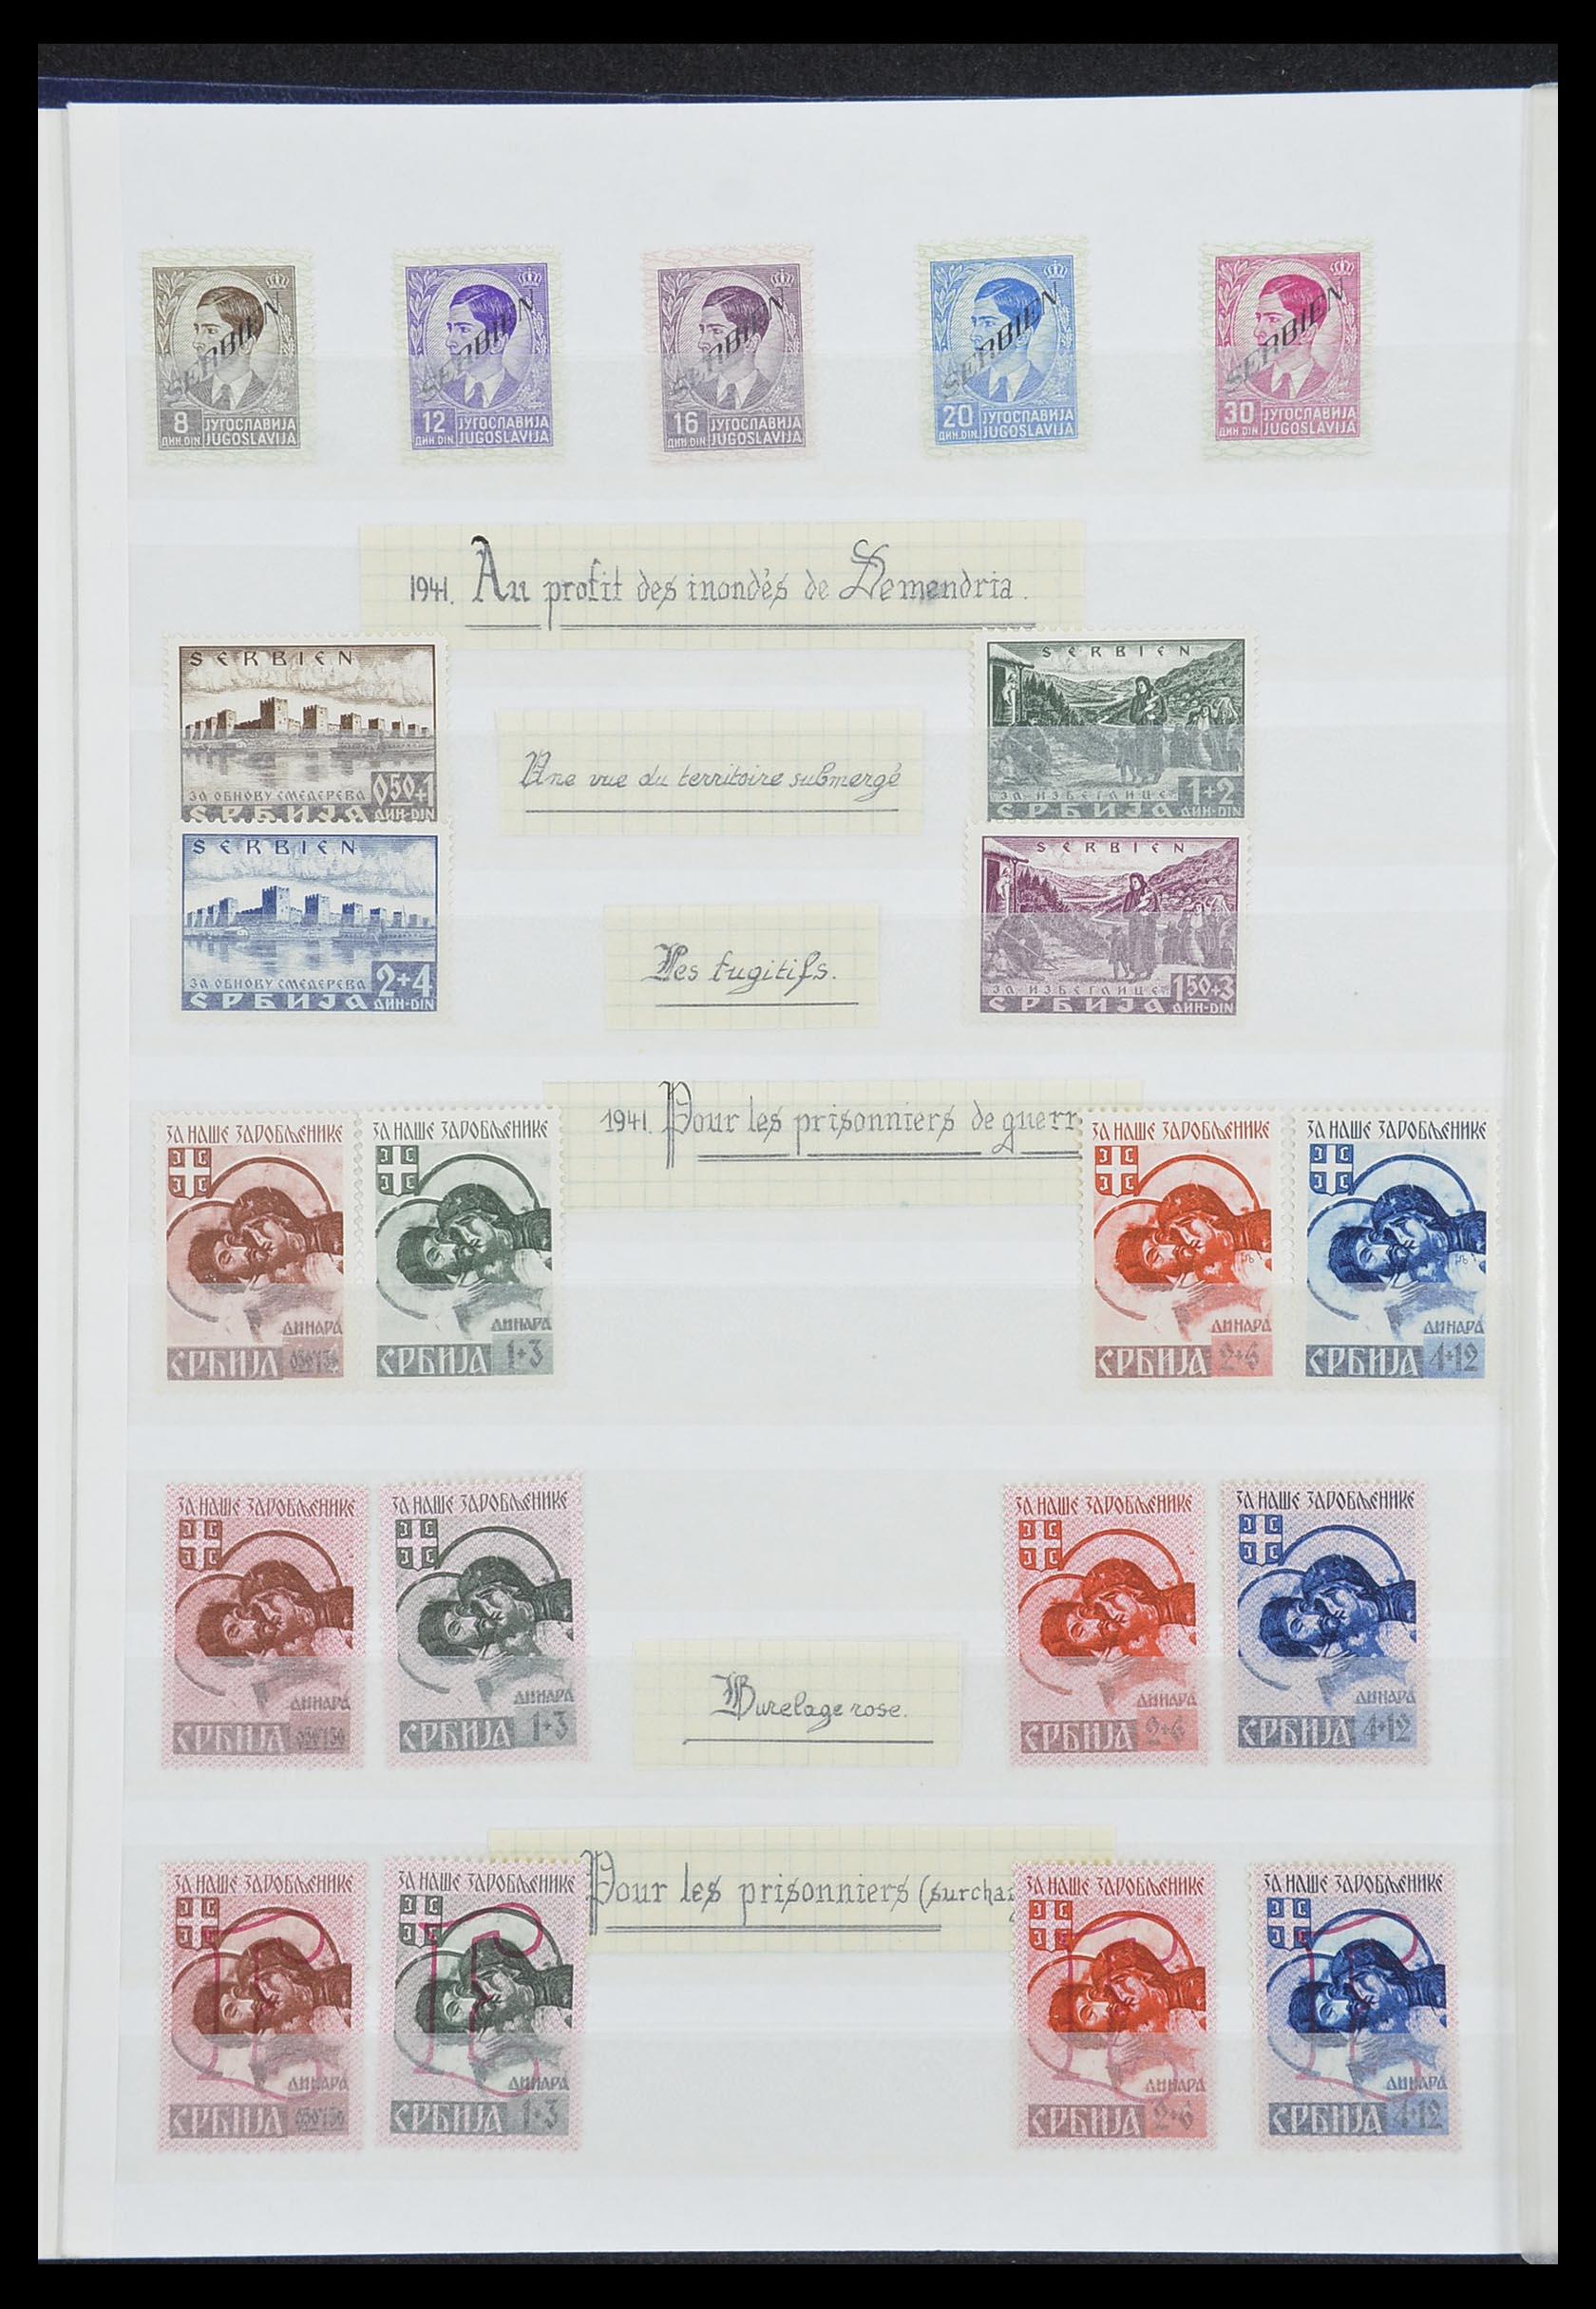 33850 014 - Postzegelverzameling 33850 Duitse bezettingen 2e wereldoorlog 1939-19